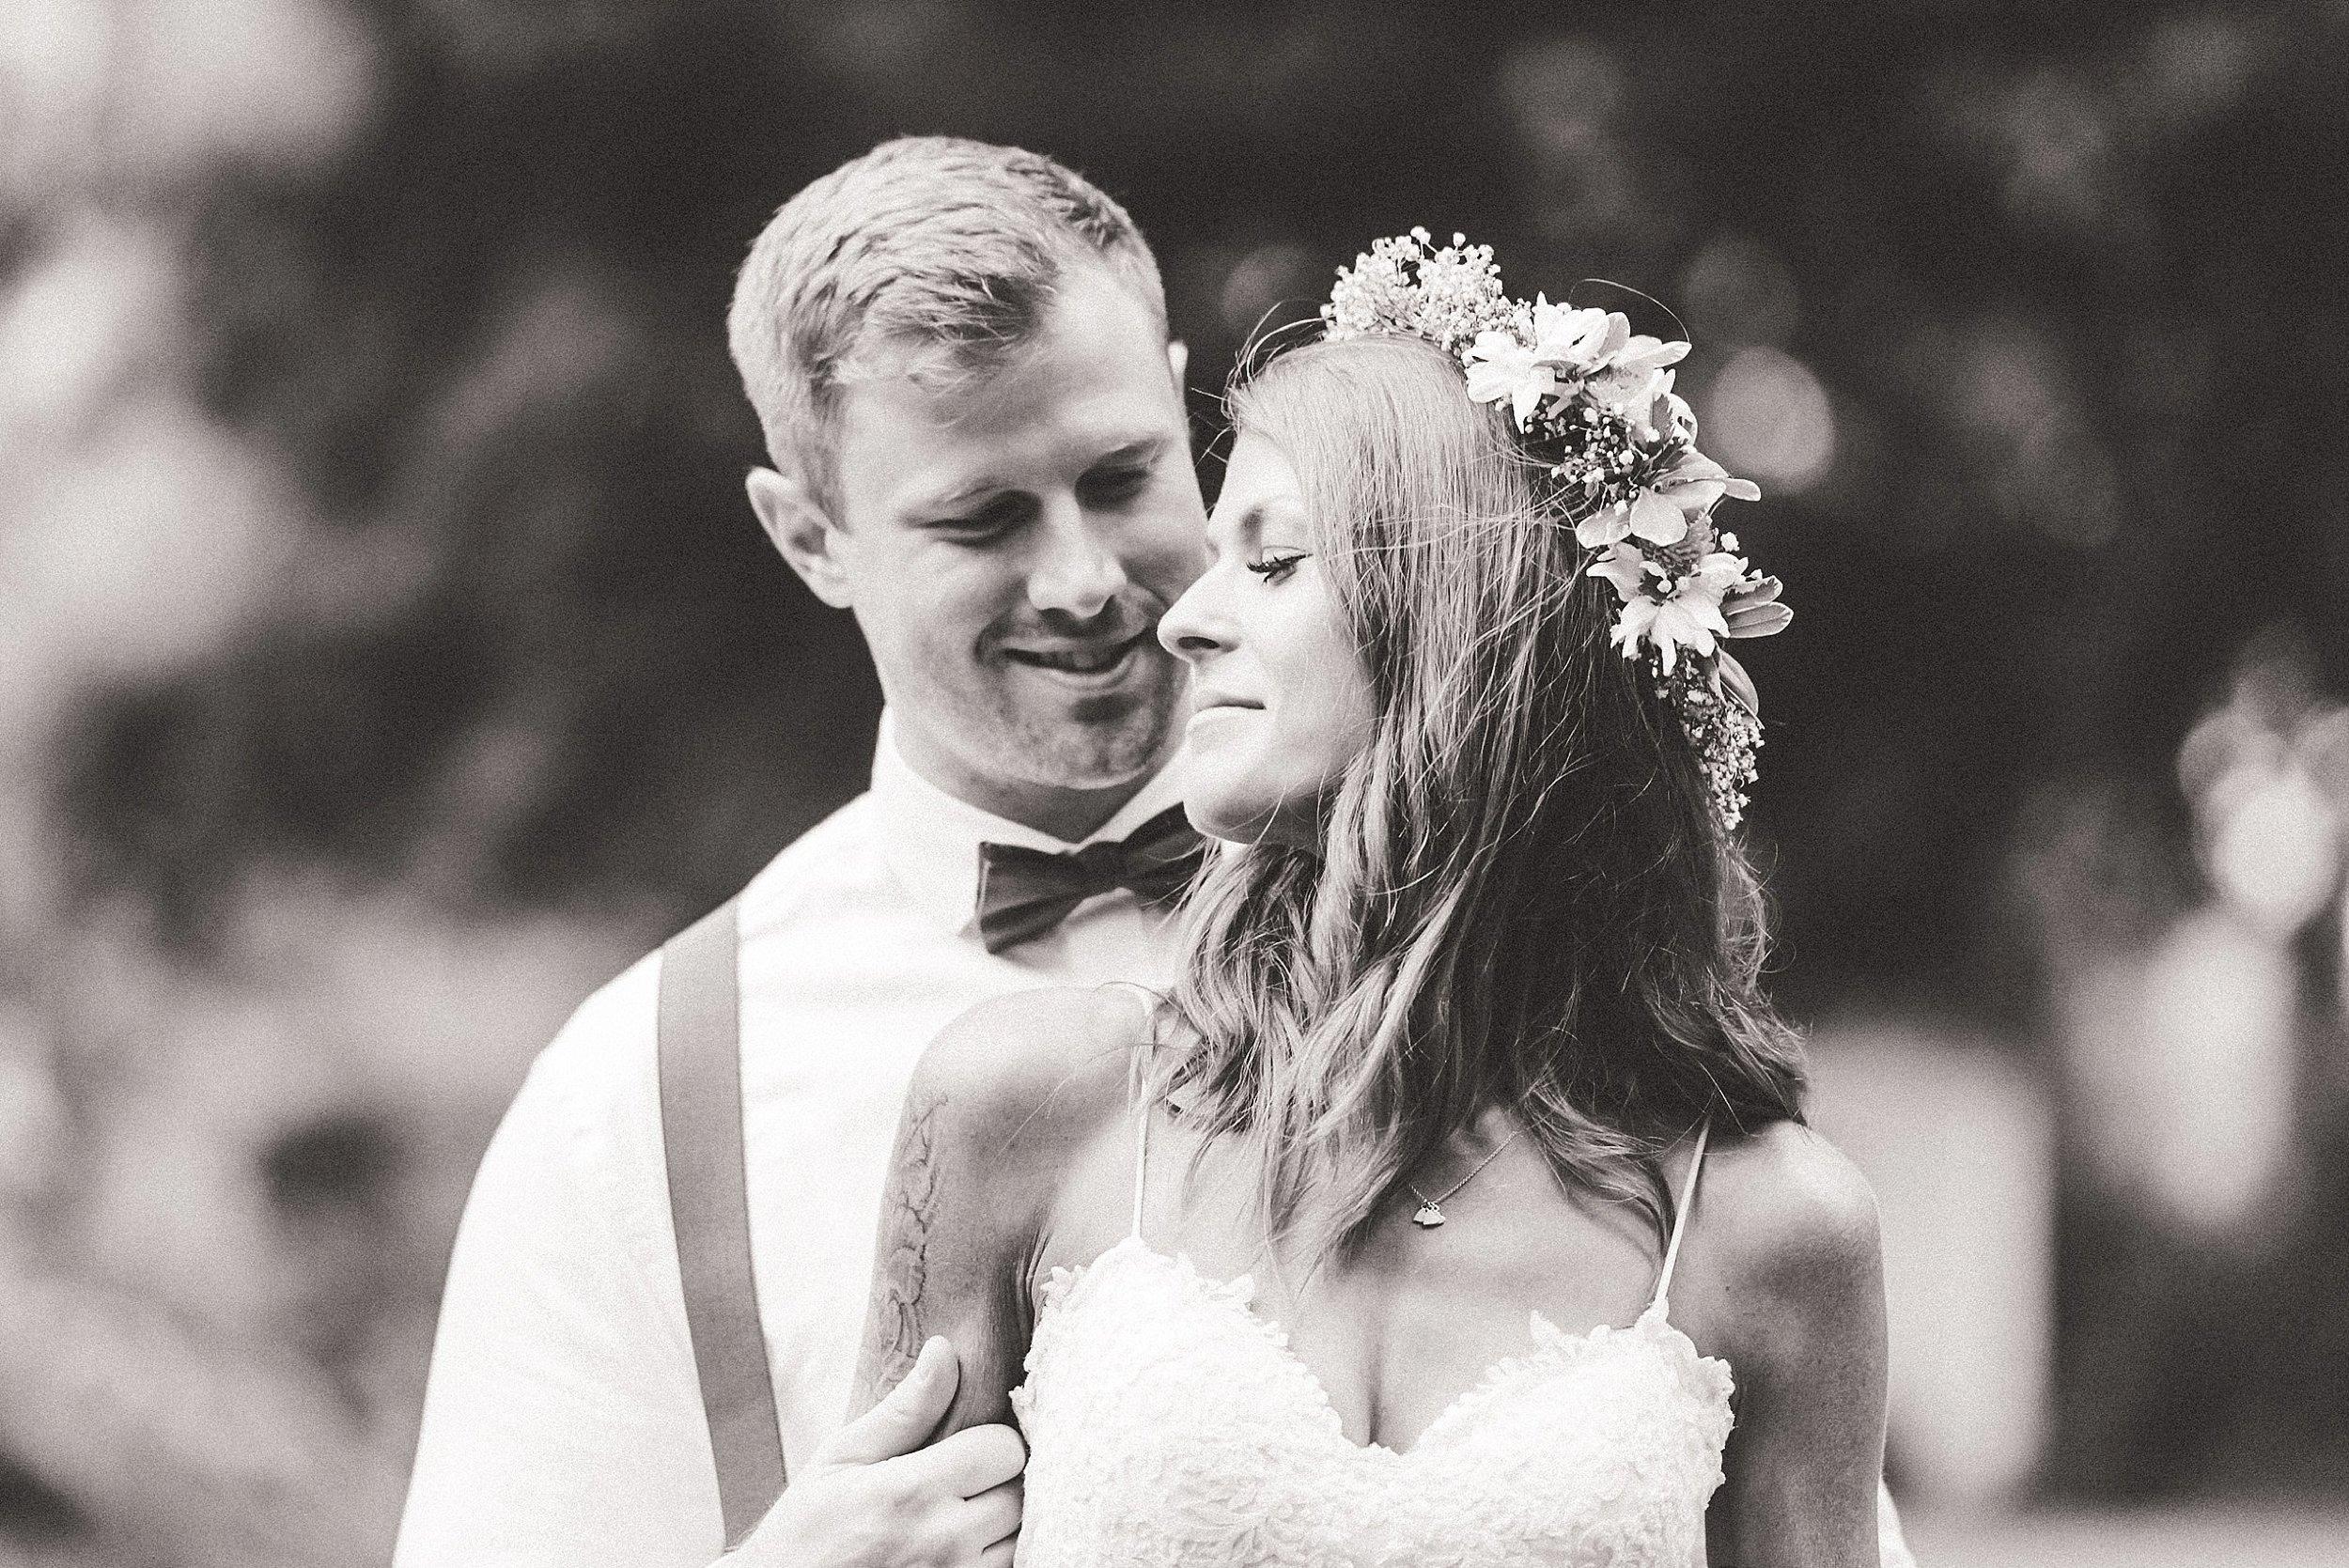 Ottawa Wedding Photographer - Stanley's Olde Maple Lane Barn Wedding - Ali & Batoul Photography_0057.jpg